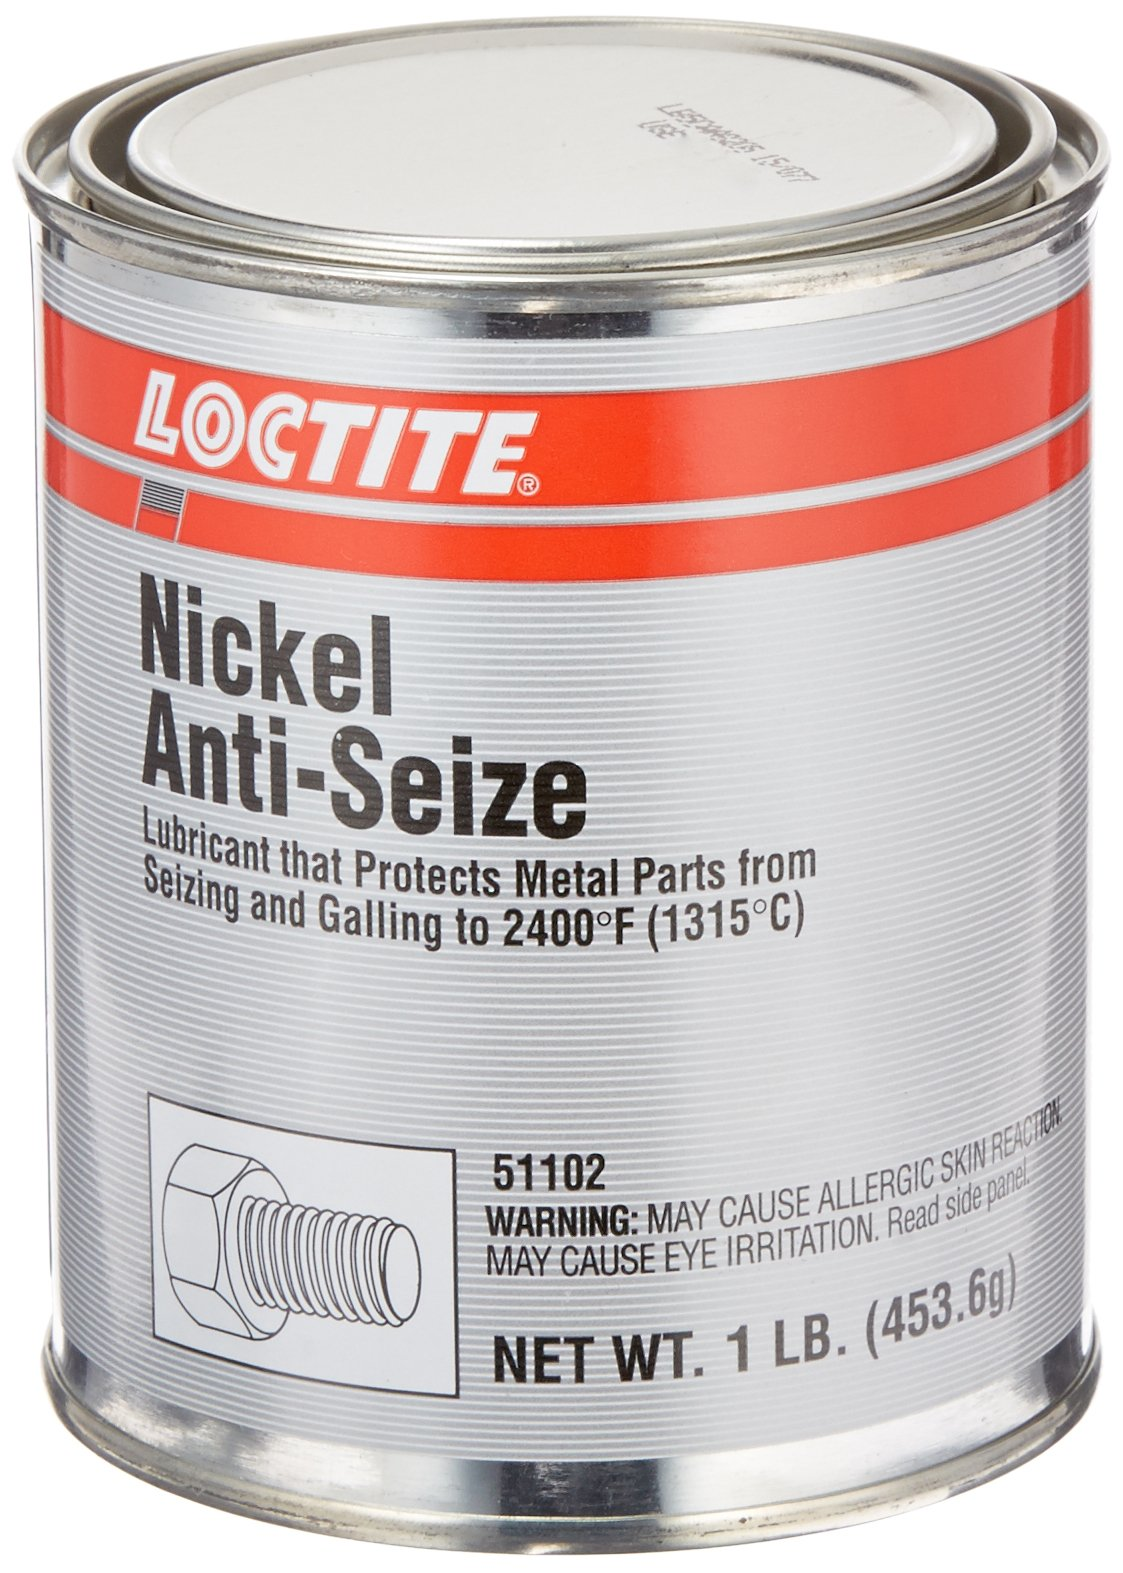 Loctite 51102 Gray LB 771 Nickel Anti-Seize Lubricant, 2400 Degree F Upper Temperature Rating, 1 lb. Can by Loctite